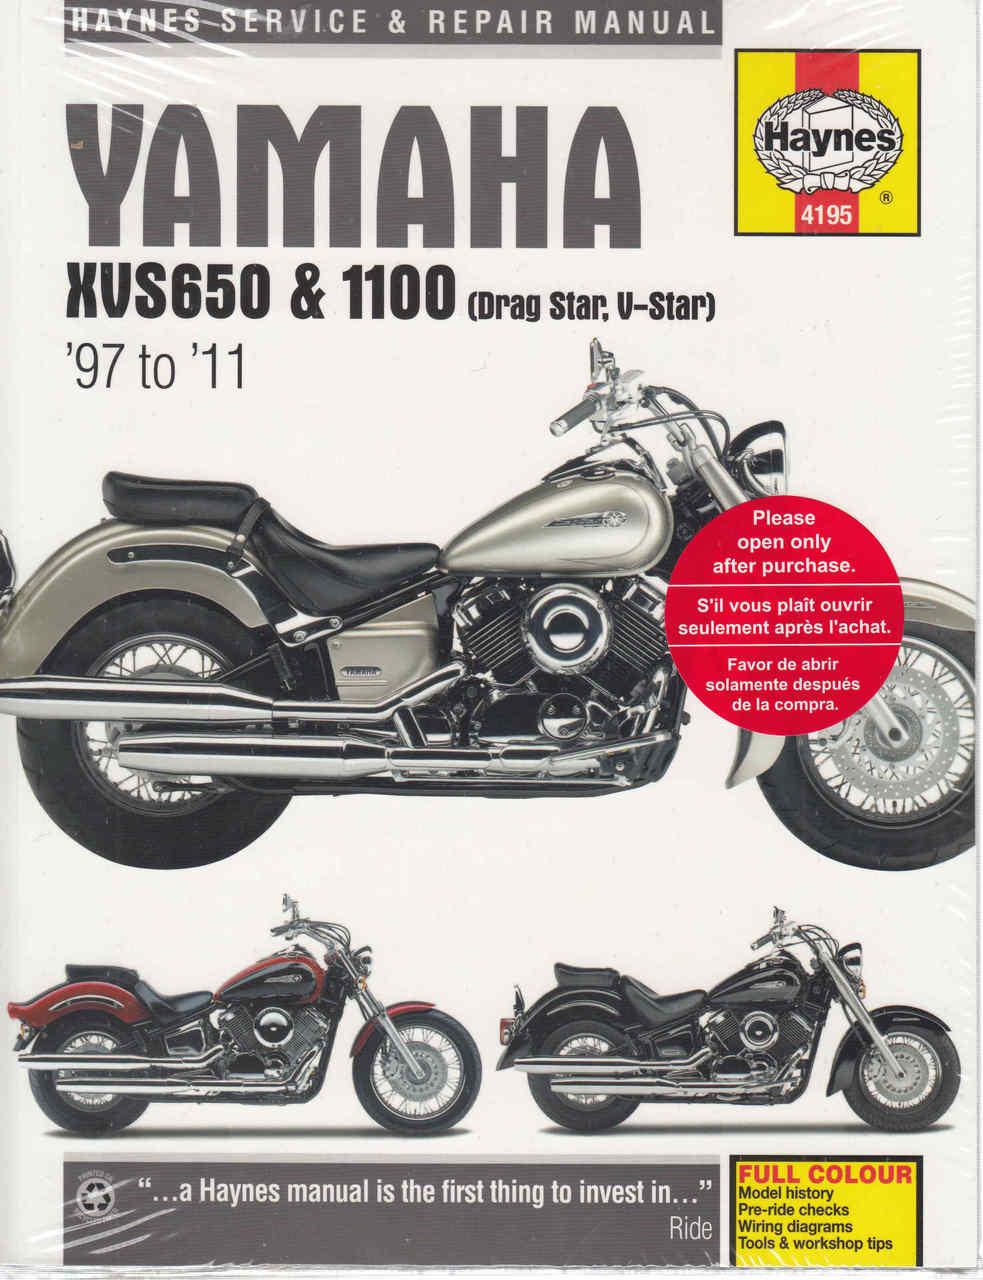 hight resolution of yamaha xvs650 amp xvs1100 drag star v star 1997 2005 workshop manual